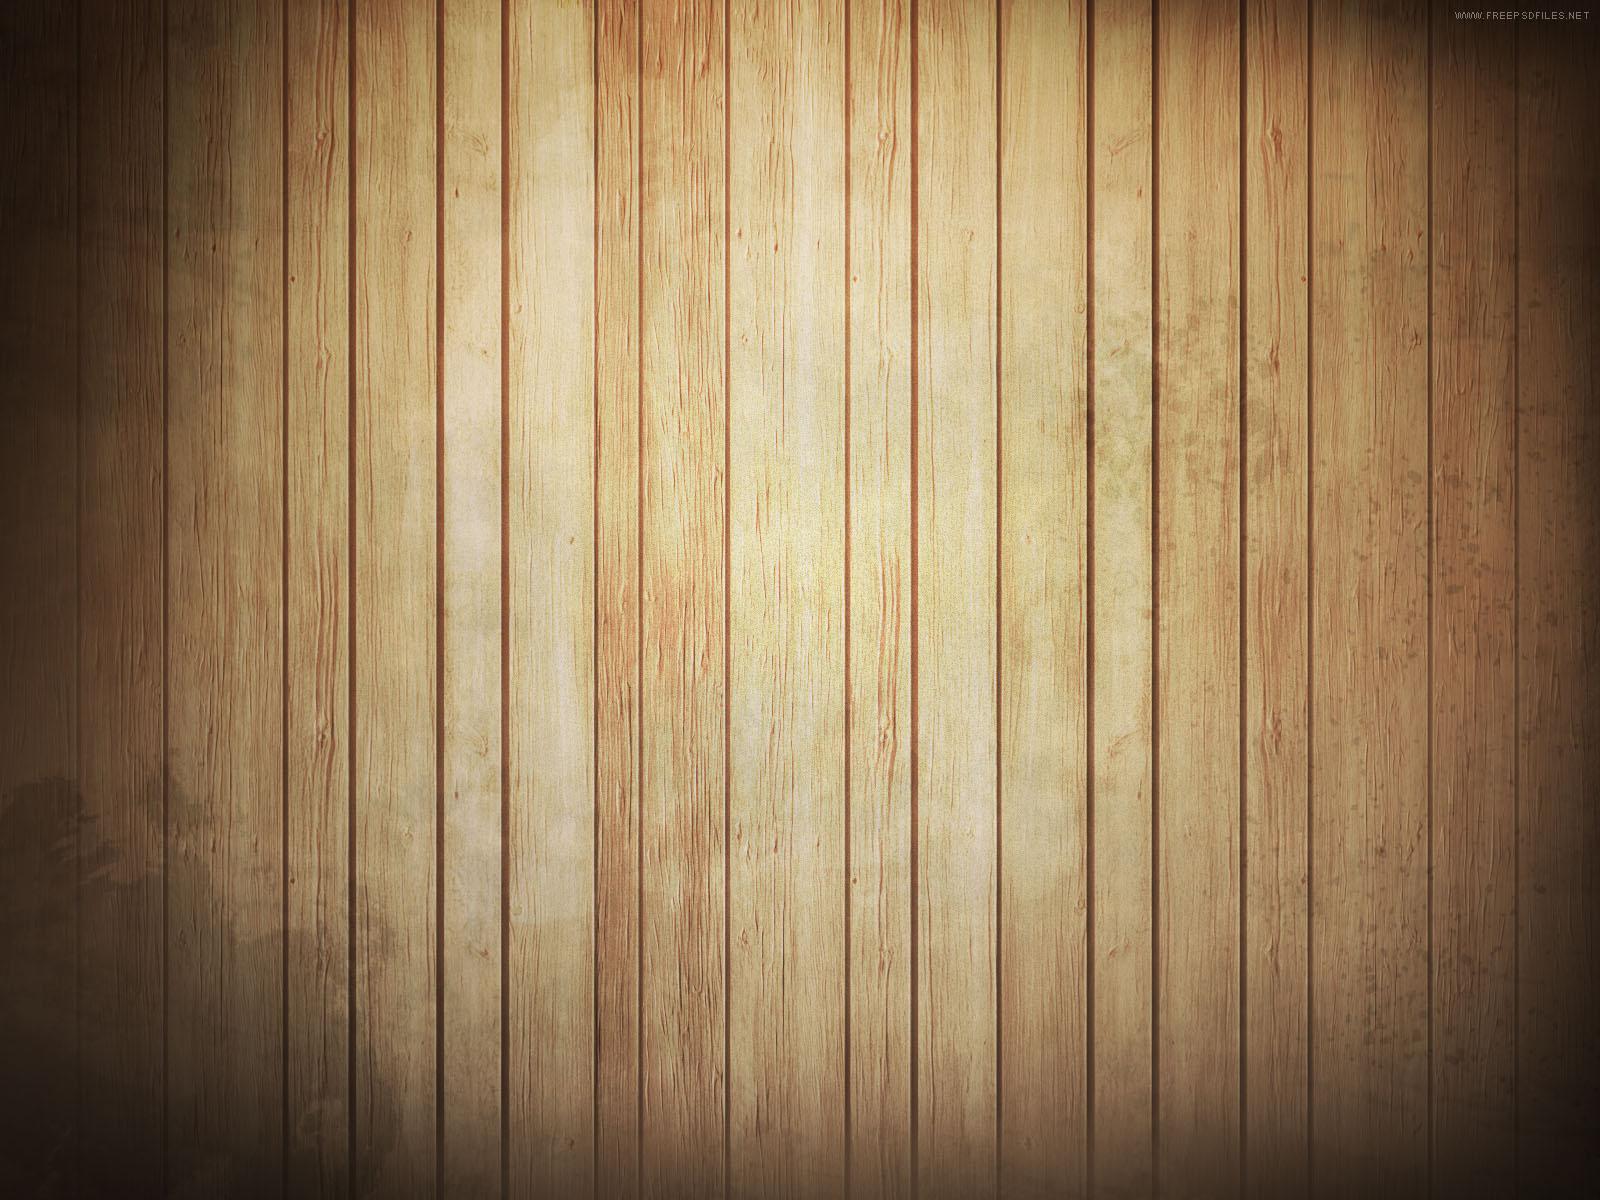 sem fundo imagens sem background background de madeira jpg. Black Bedroom Furniture Sets. Home Design Ideas